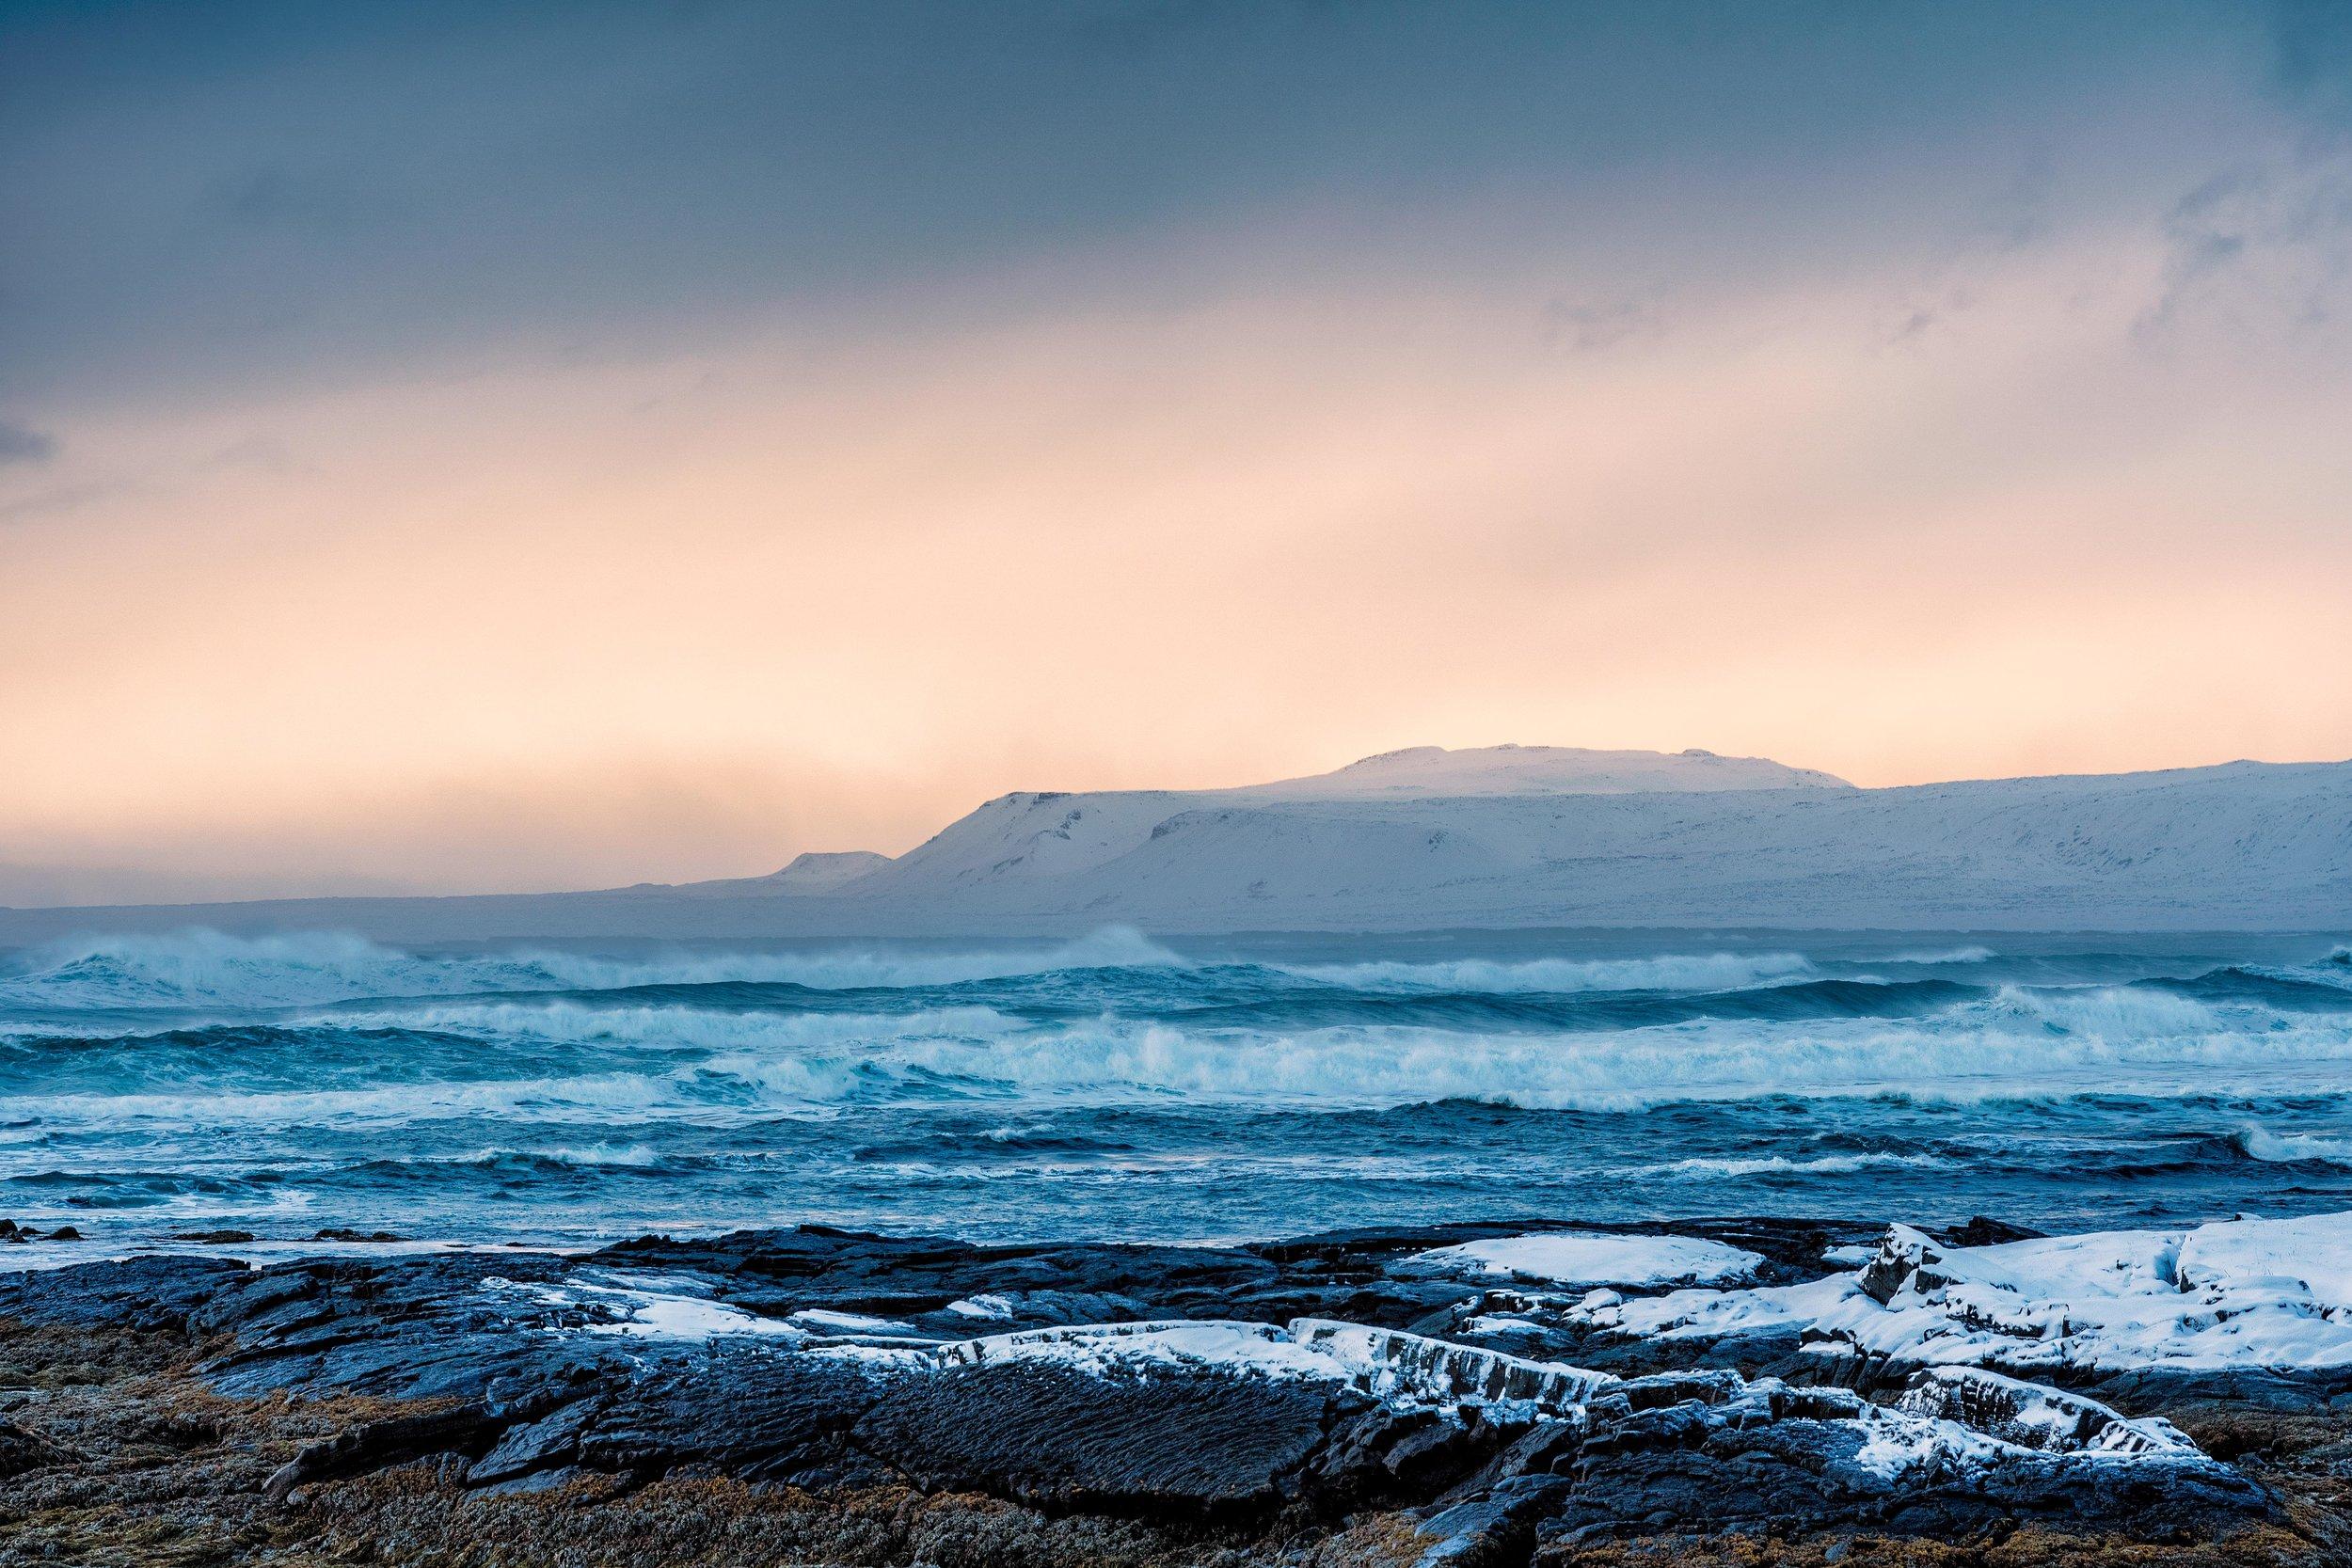 Iceland. snow. travel. adventure. photography. trip. epic landscape. snow. cold. freezing. sunrise. nothern lights. iceland seascape.jpg